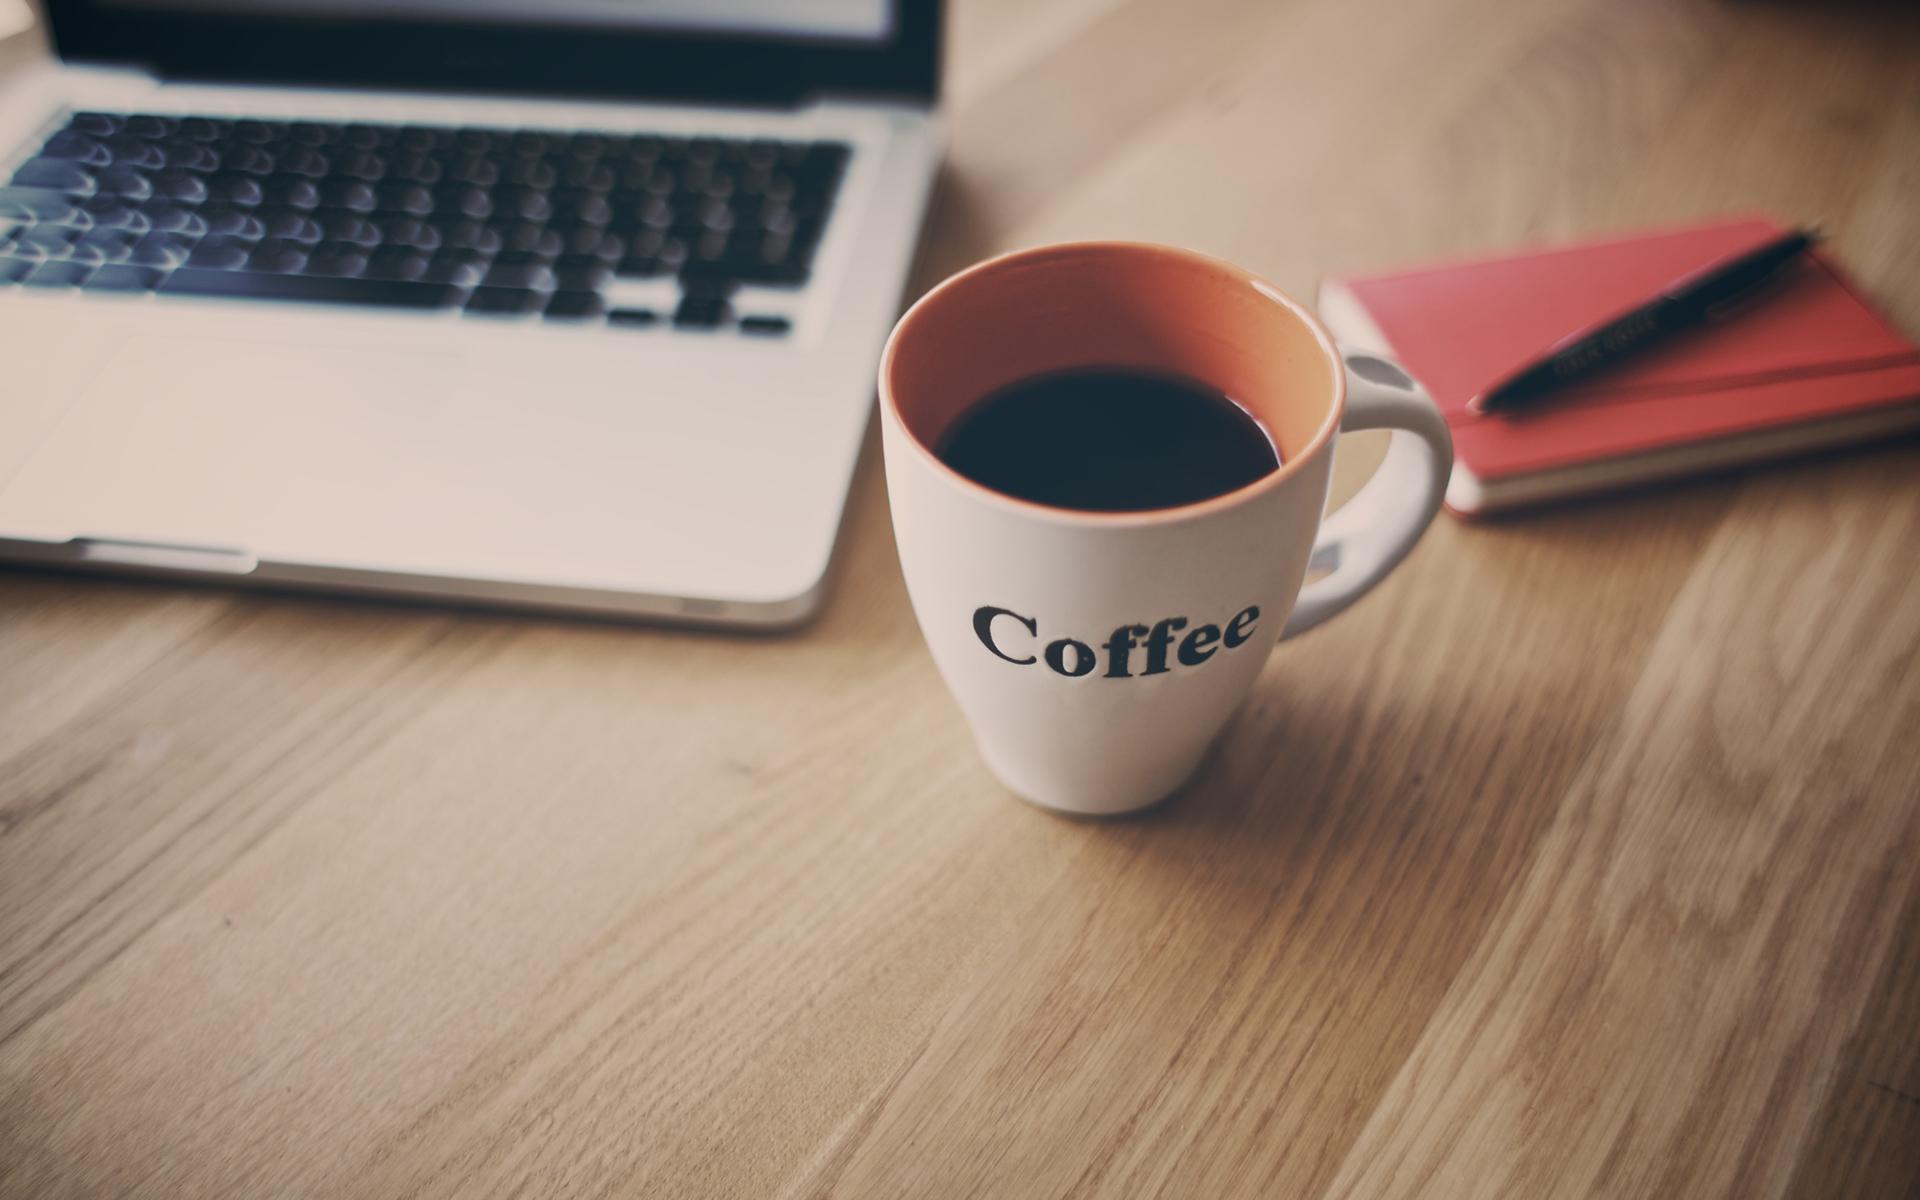 Coffee Cup Wallpaper 38720 39606 Hd Wallpapers Mlfitness